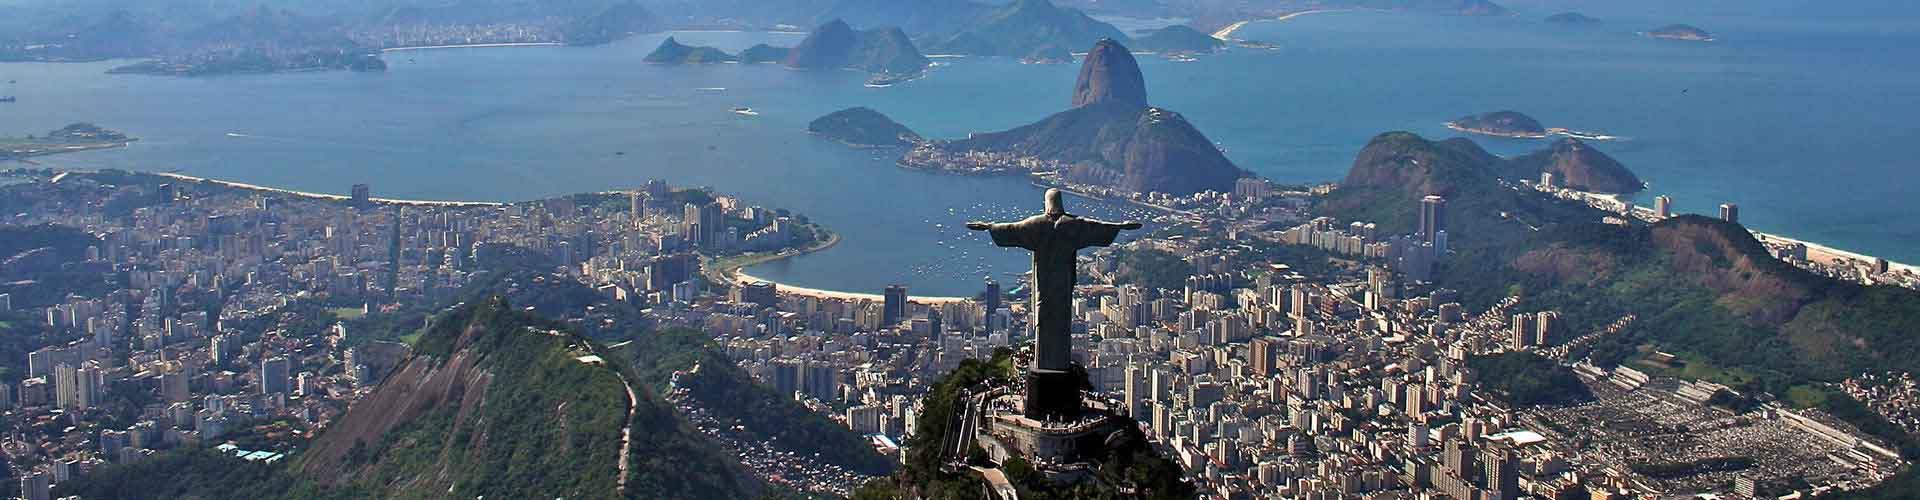 Río de Janeiro - Hostales cerca a Cristo Redentor. Mapas de Río de Janeiro, Fotos y comentarios de cada Hostal en Río de Janeiro.